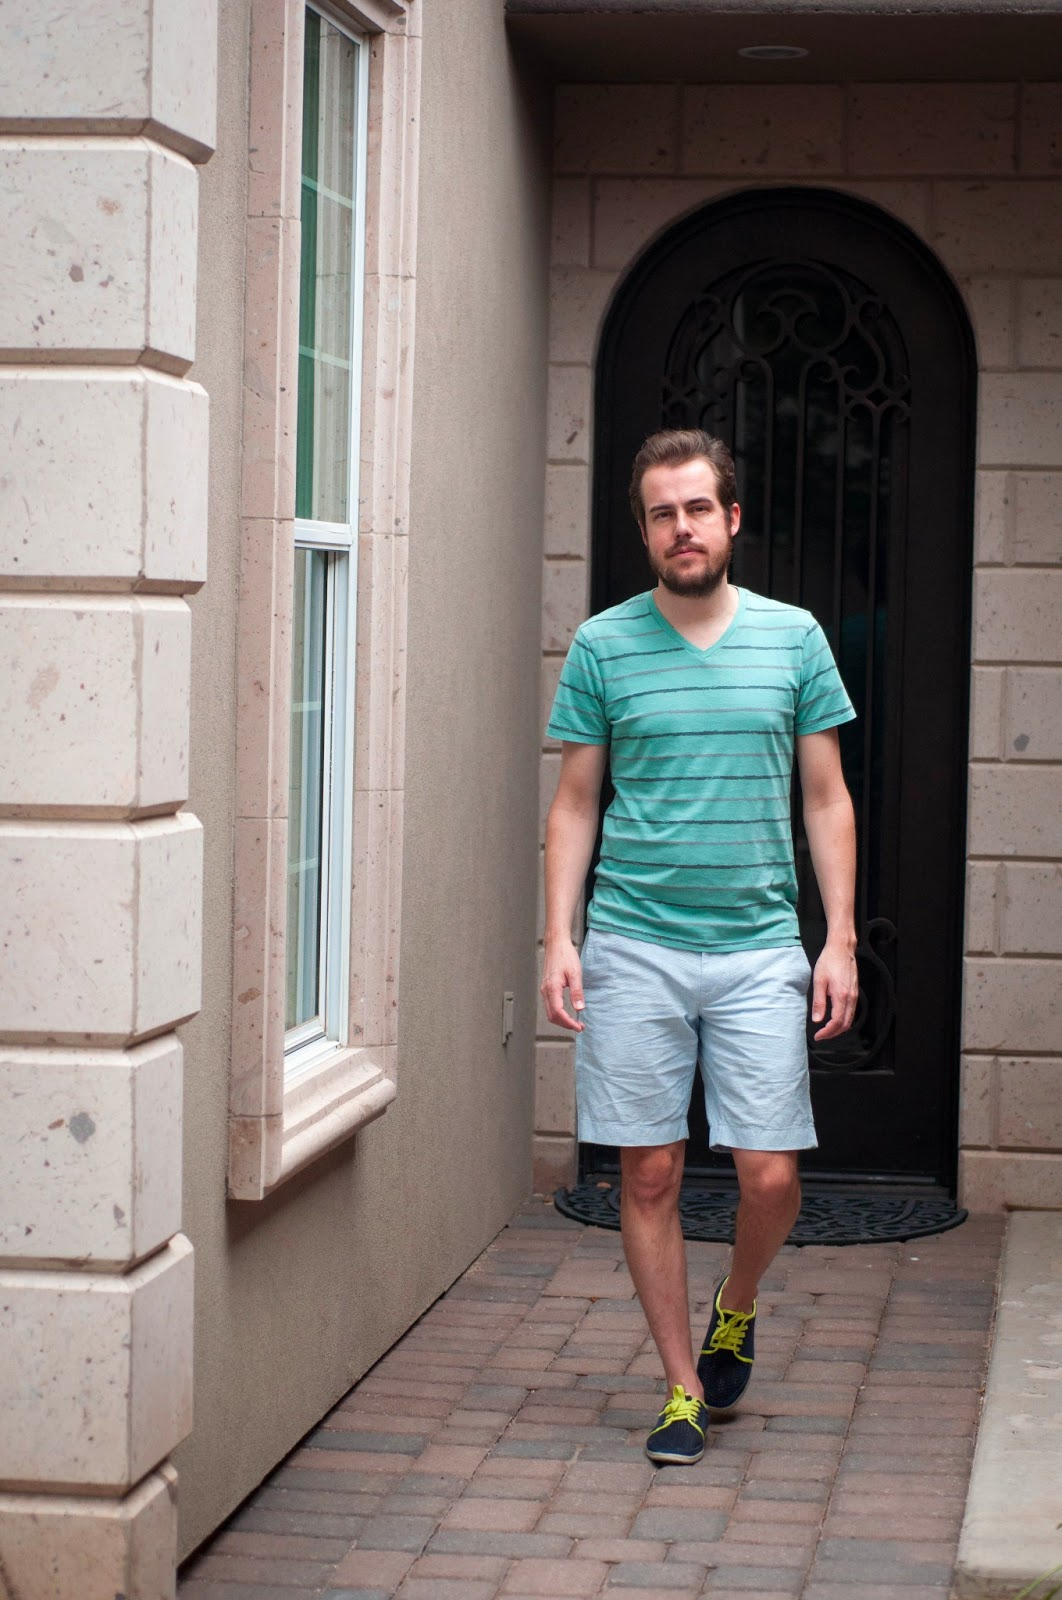 "mens style, mens fashion, zara shoes, jcrew 9"" stanton shorts, jcrew, vneck, bright shoes, stripes"